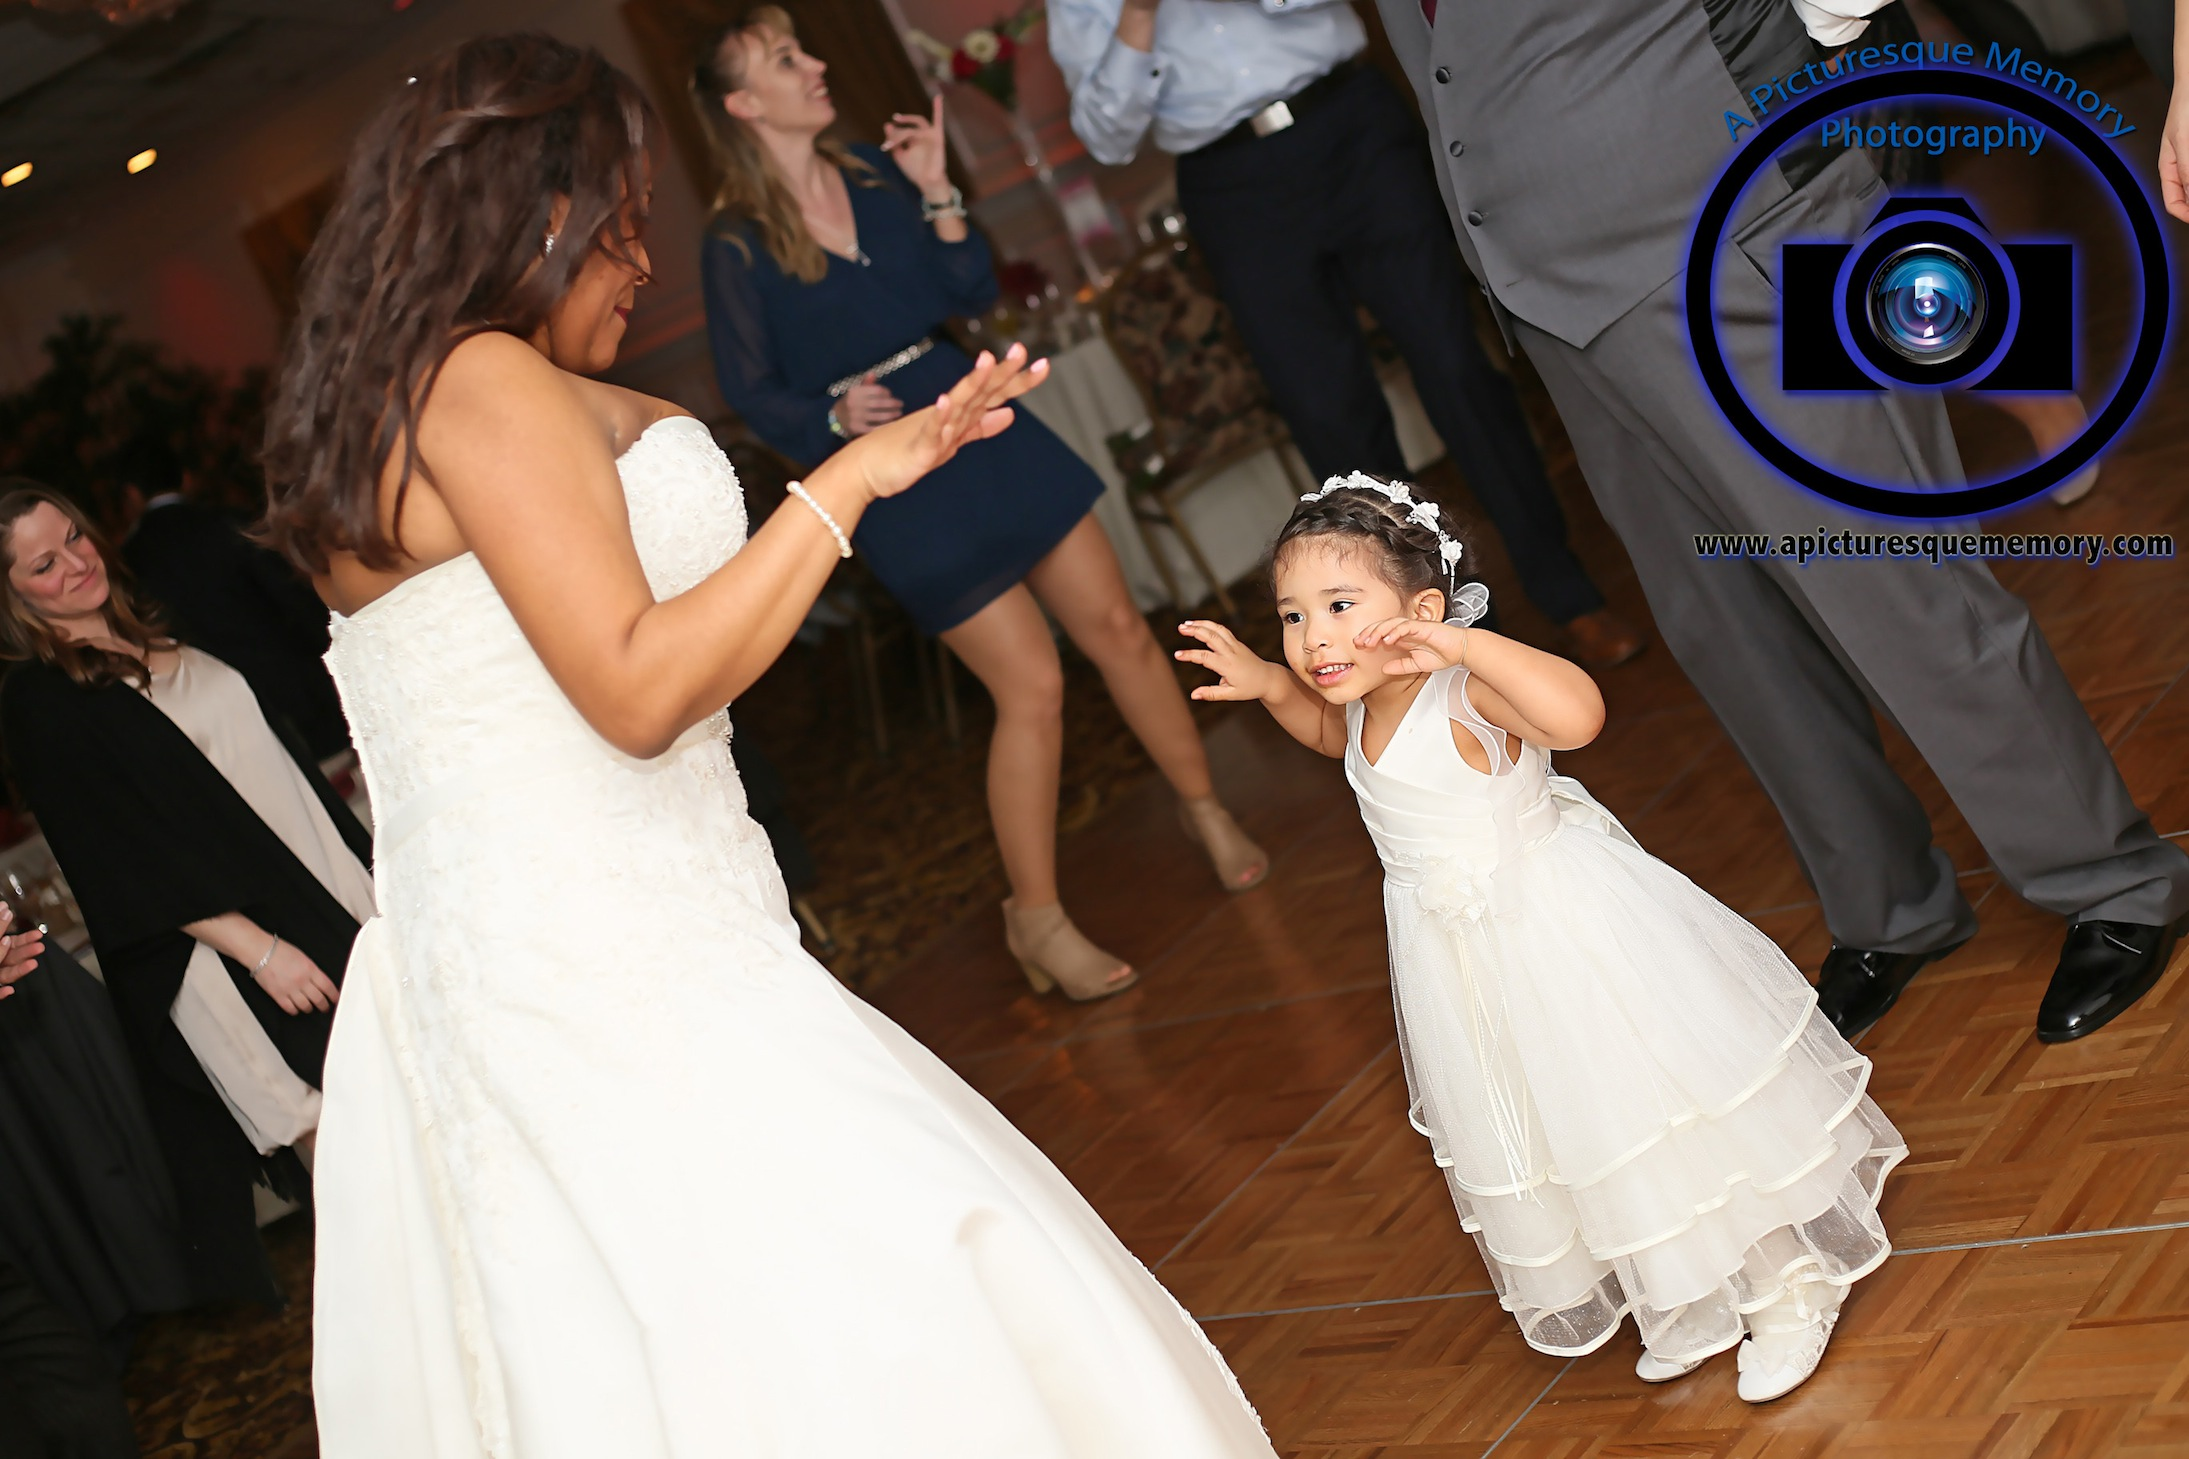 #njwedding, #njweddingphotography, #southbrunswickweddingphotographer#weddingphotos, #apicturesquememoryphotography, #pierresofsouthbrunswickweddingphotographer, #bridedancing, #flowergirl